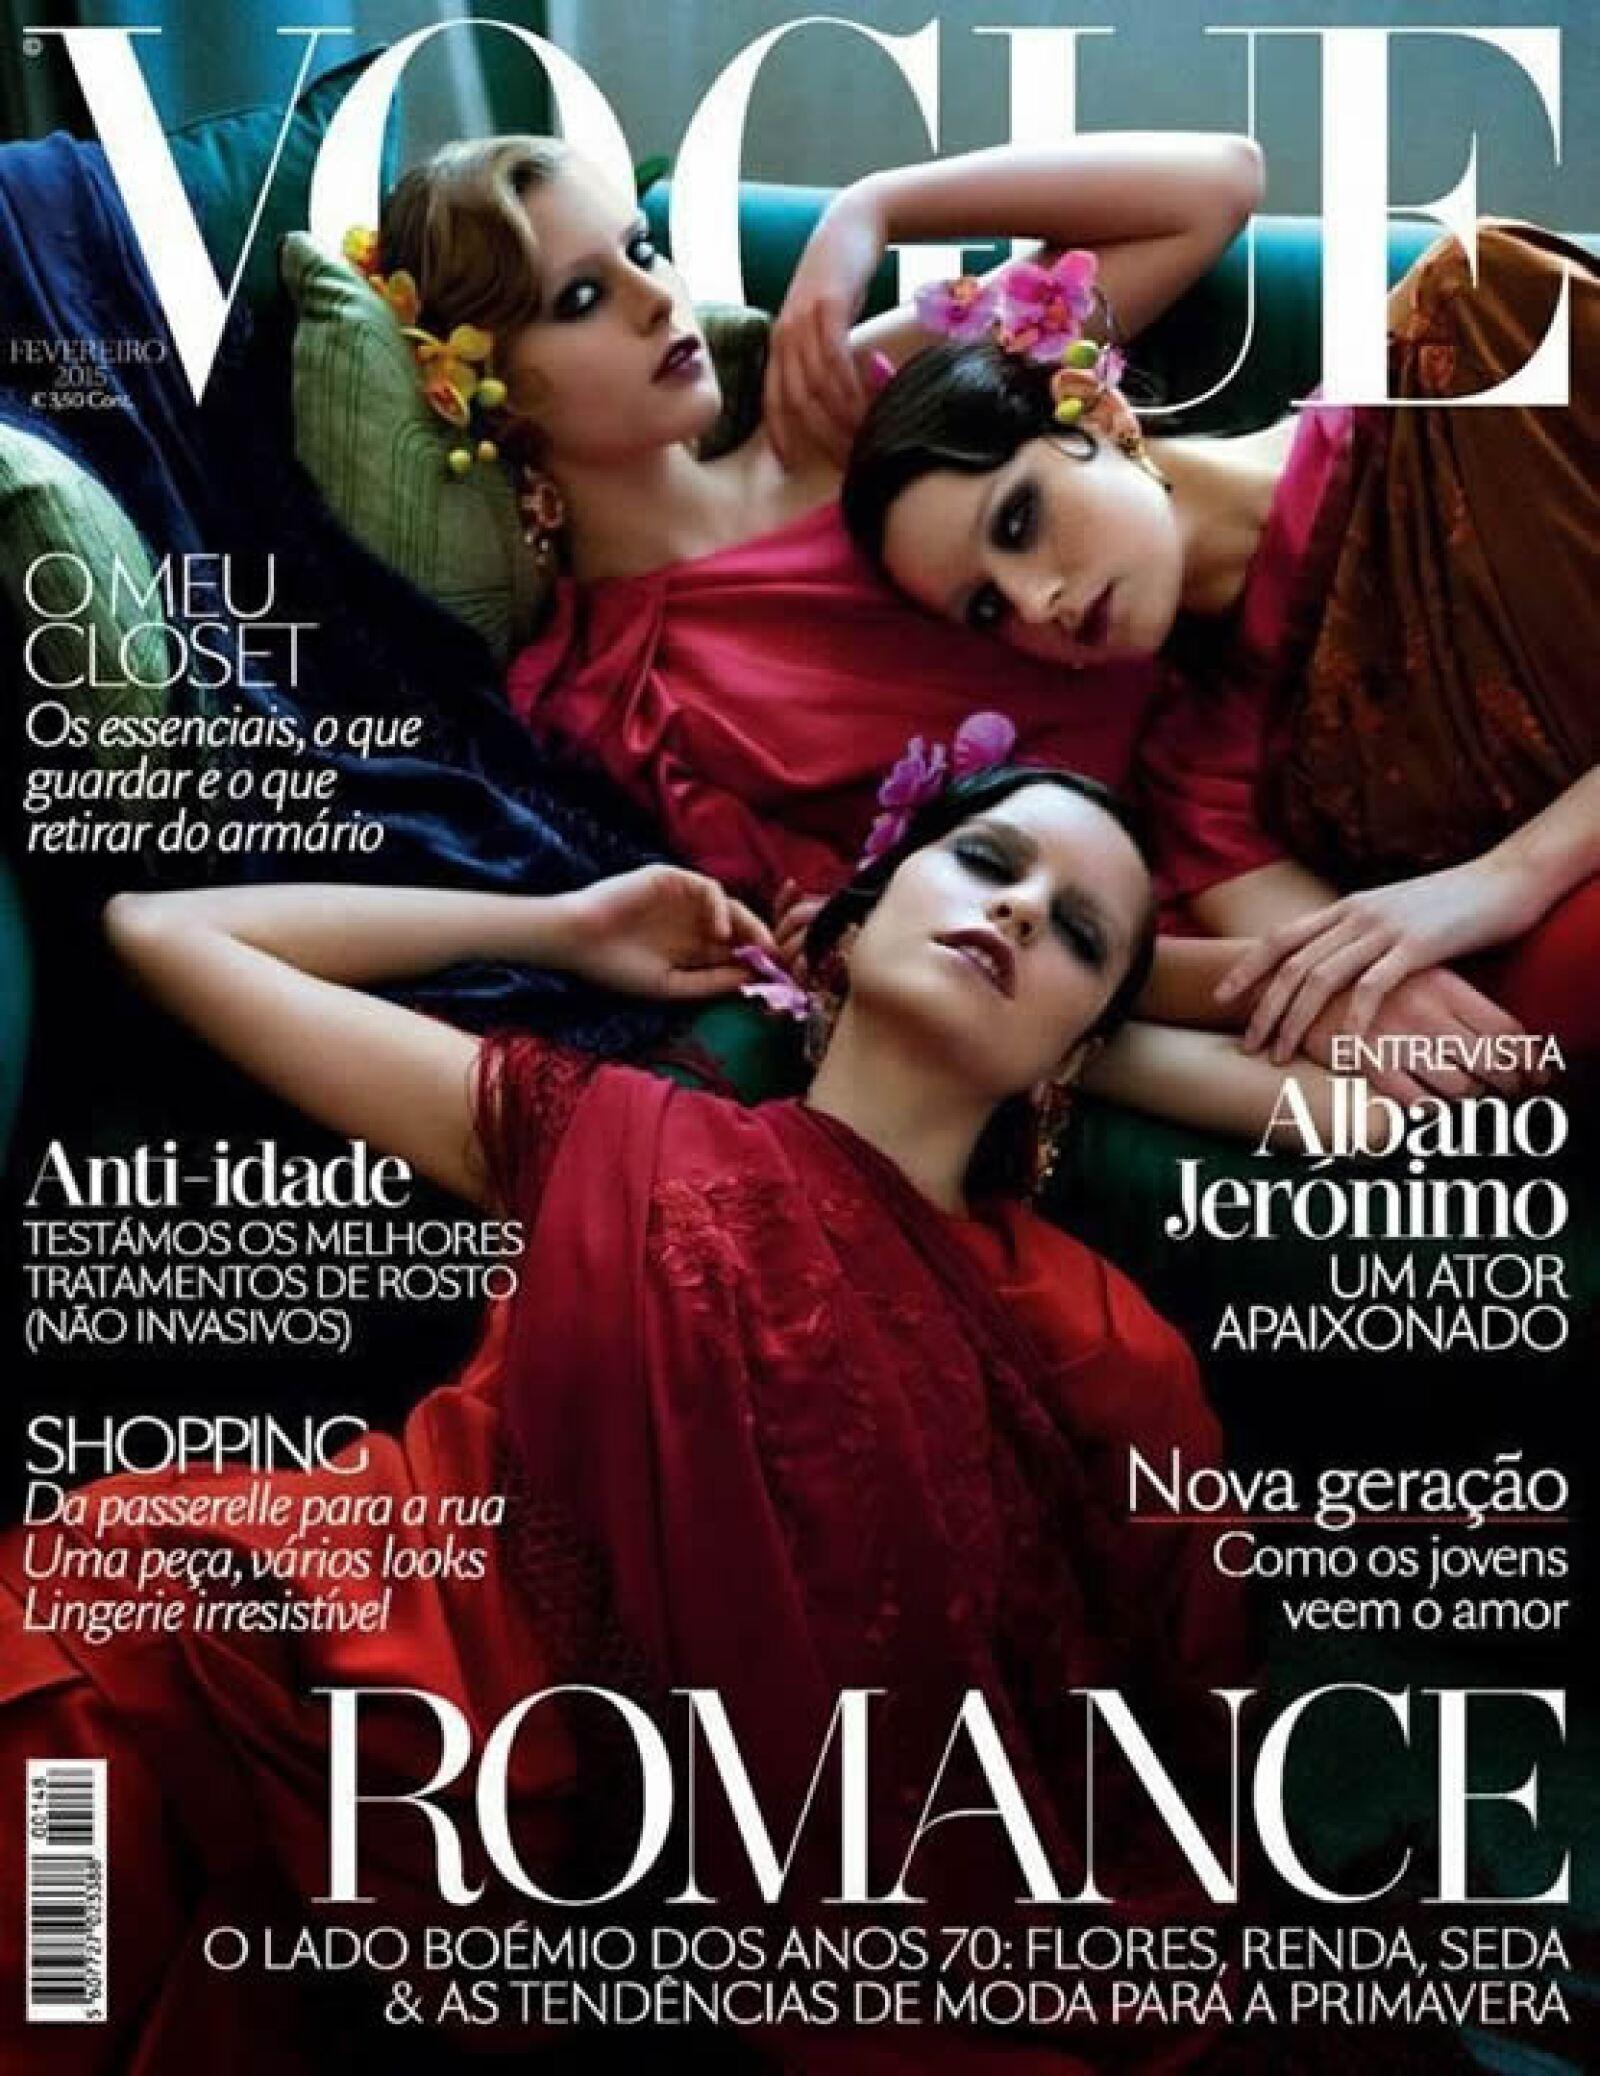 Sandra Martins, Marianne Bittencourt y Catarina Santos, son la portada de Vogue Portugal.